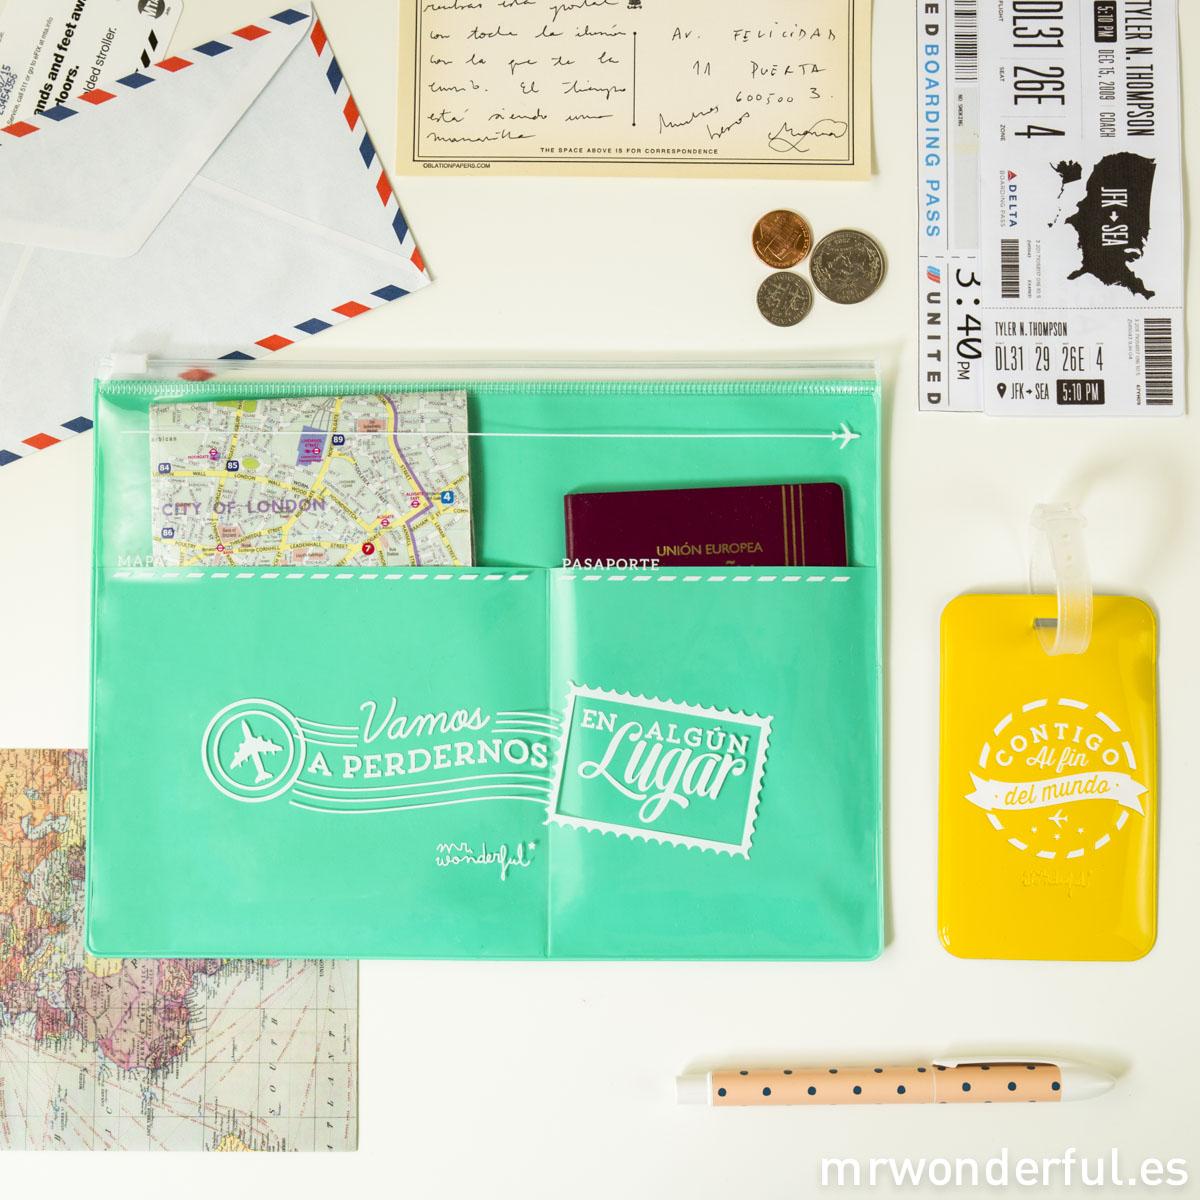 mrwonderful_FUNDA-IDENT_MINT_pack-funda-pasaporte-etiqueta-equipaje-10-Editar